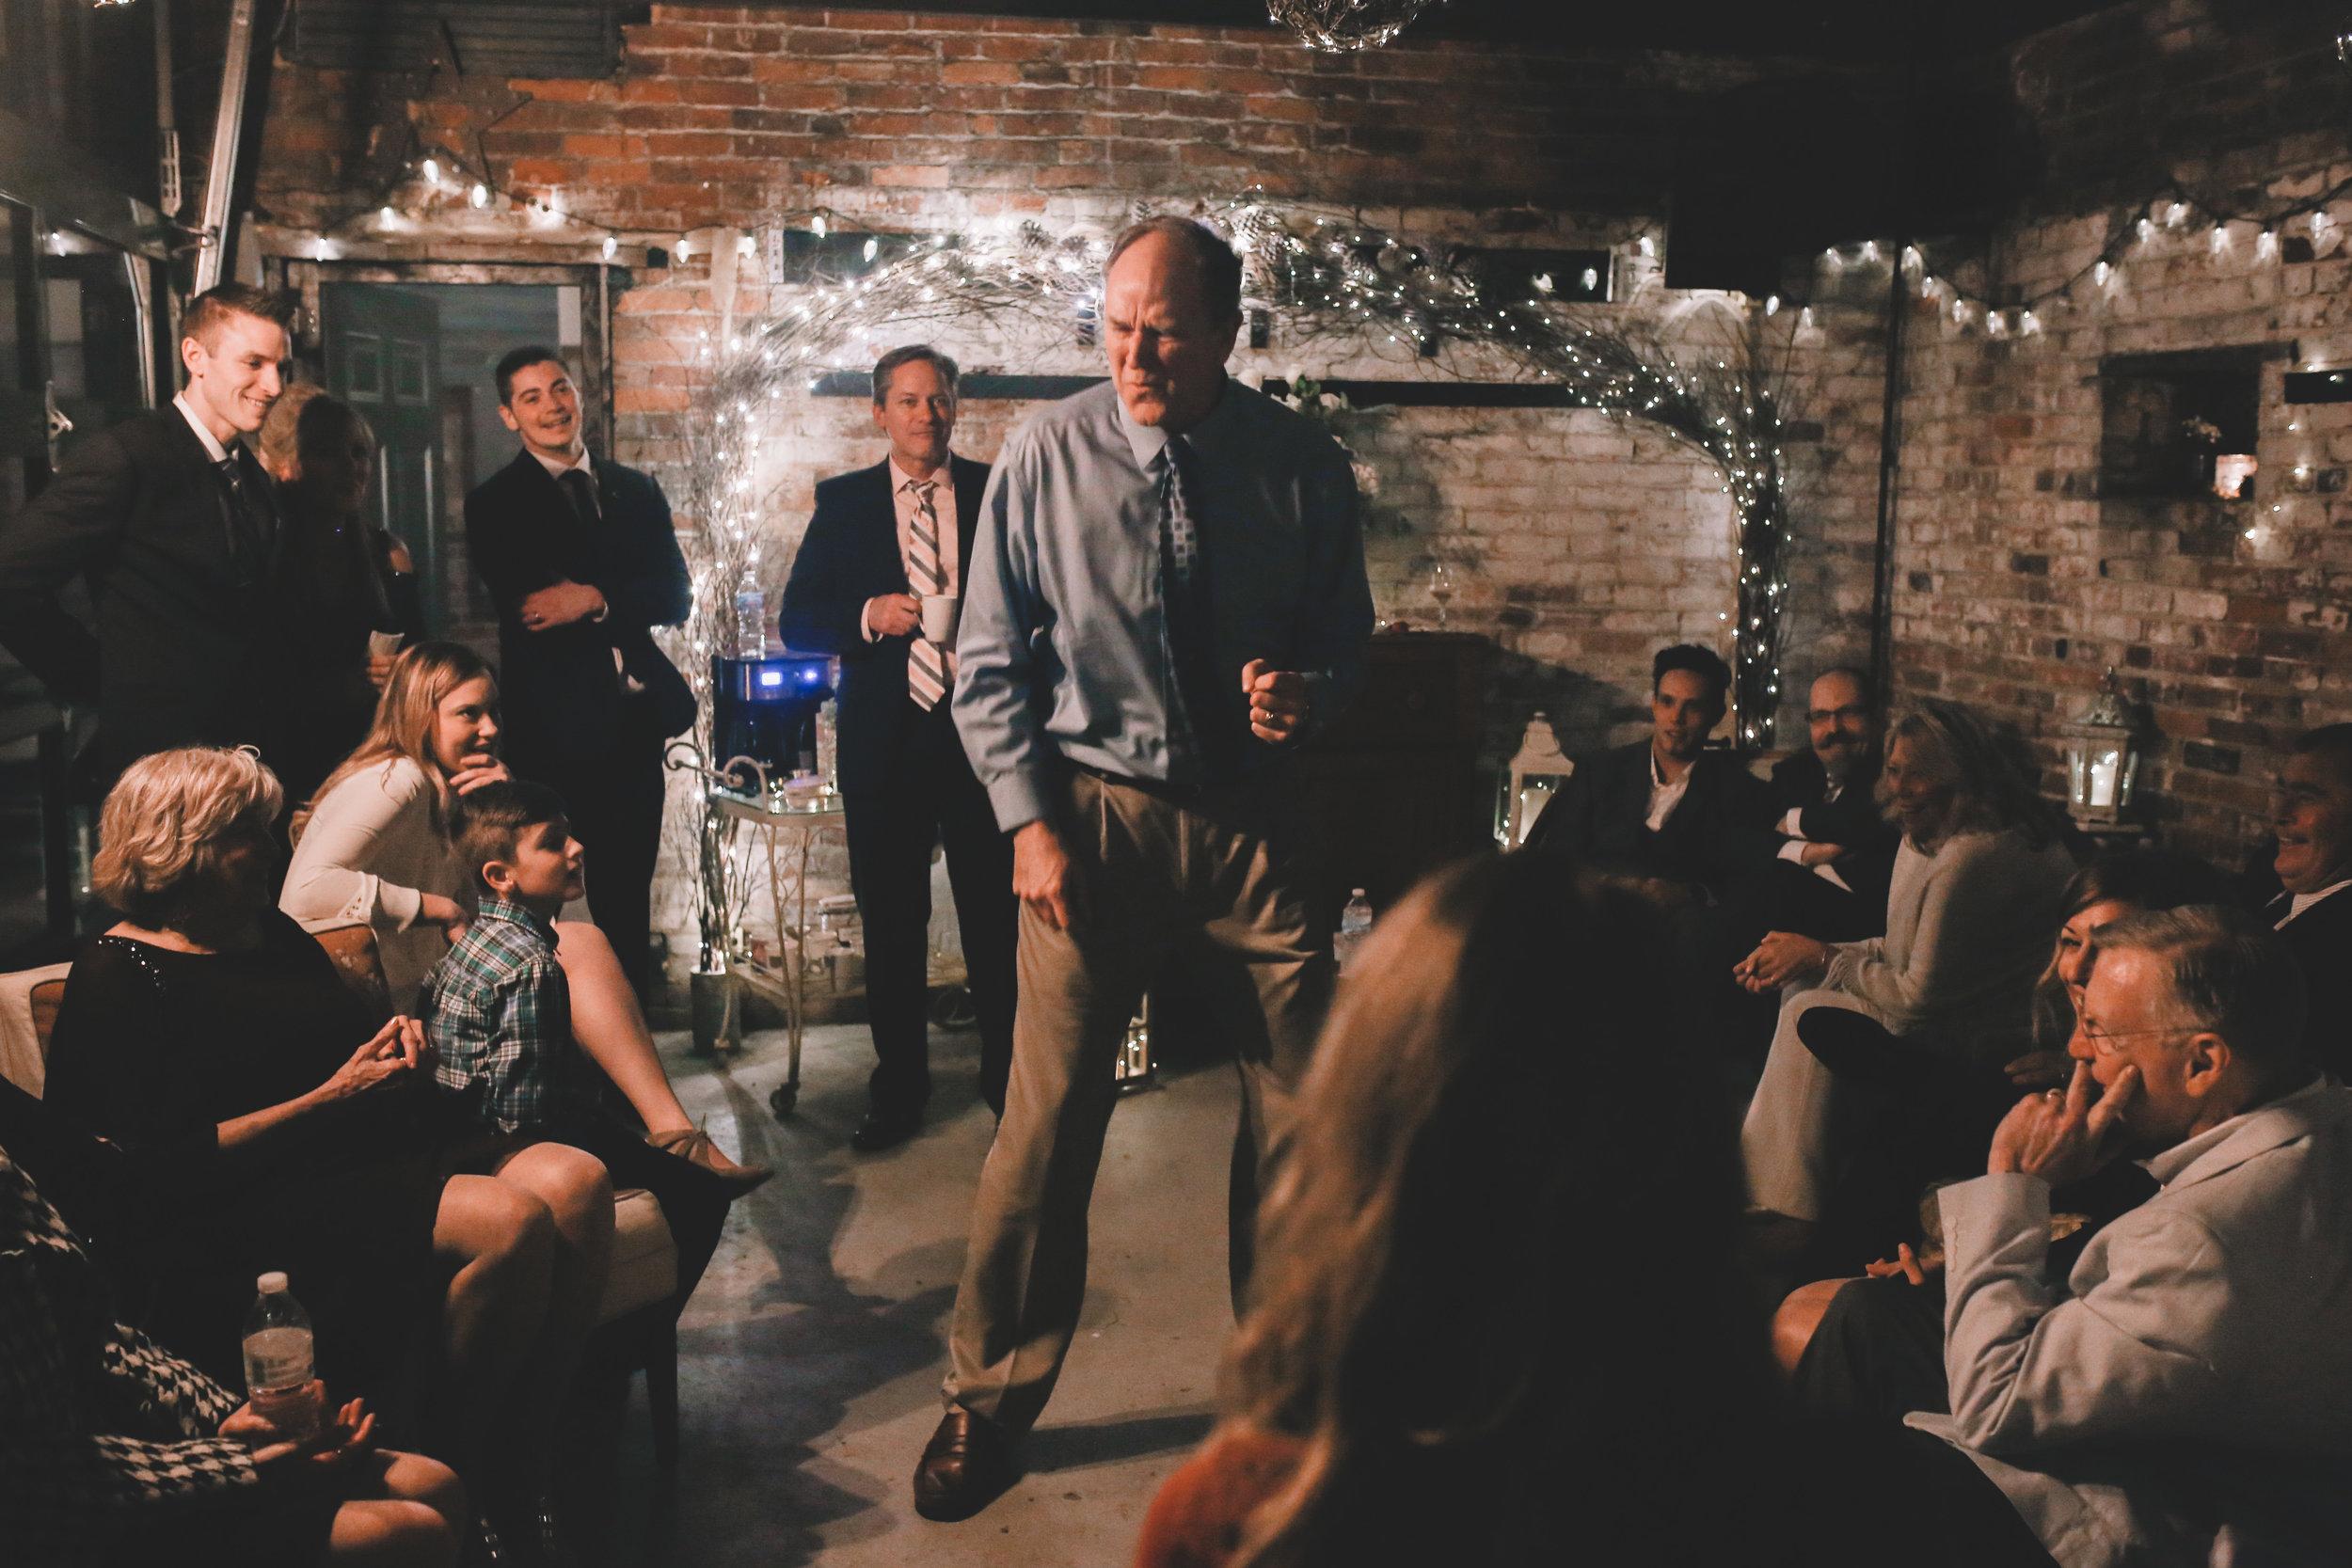 Jake + Brittney Balbas Airbnb Carriage House Wedding Evansville IN (411 of 426).jpg